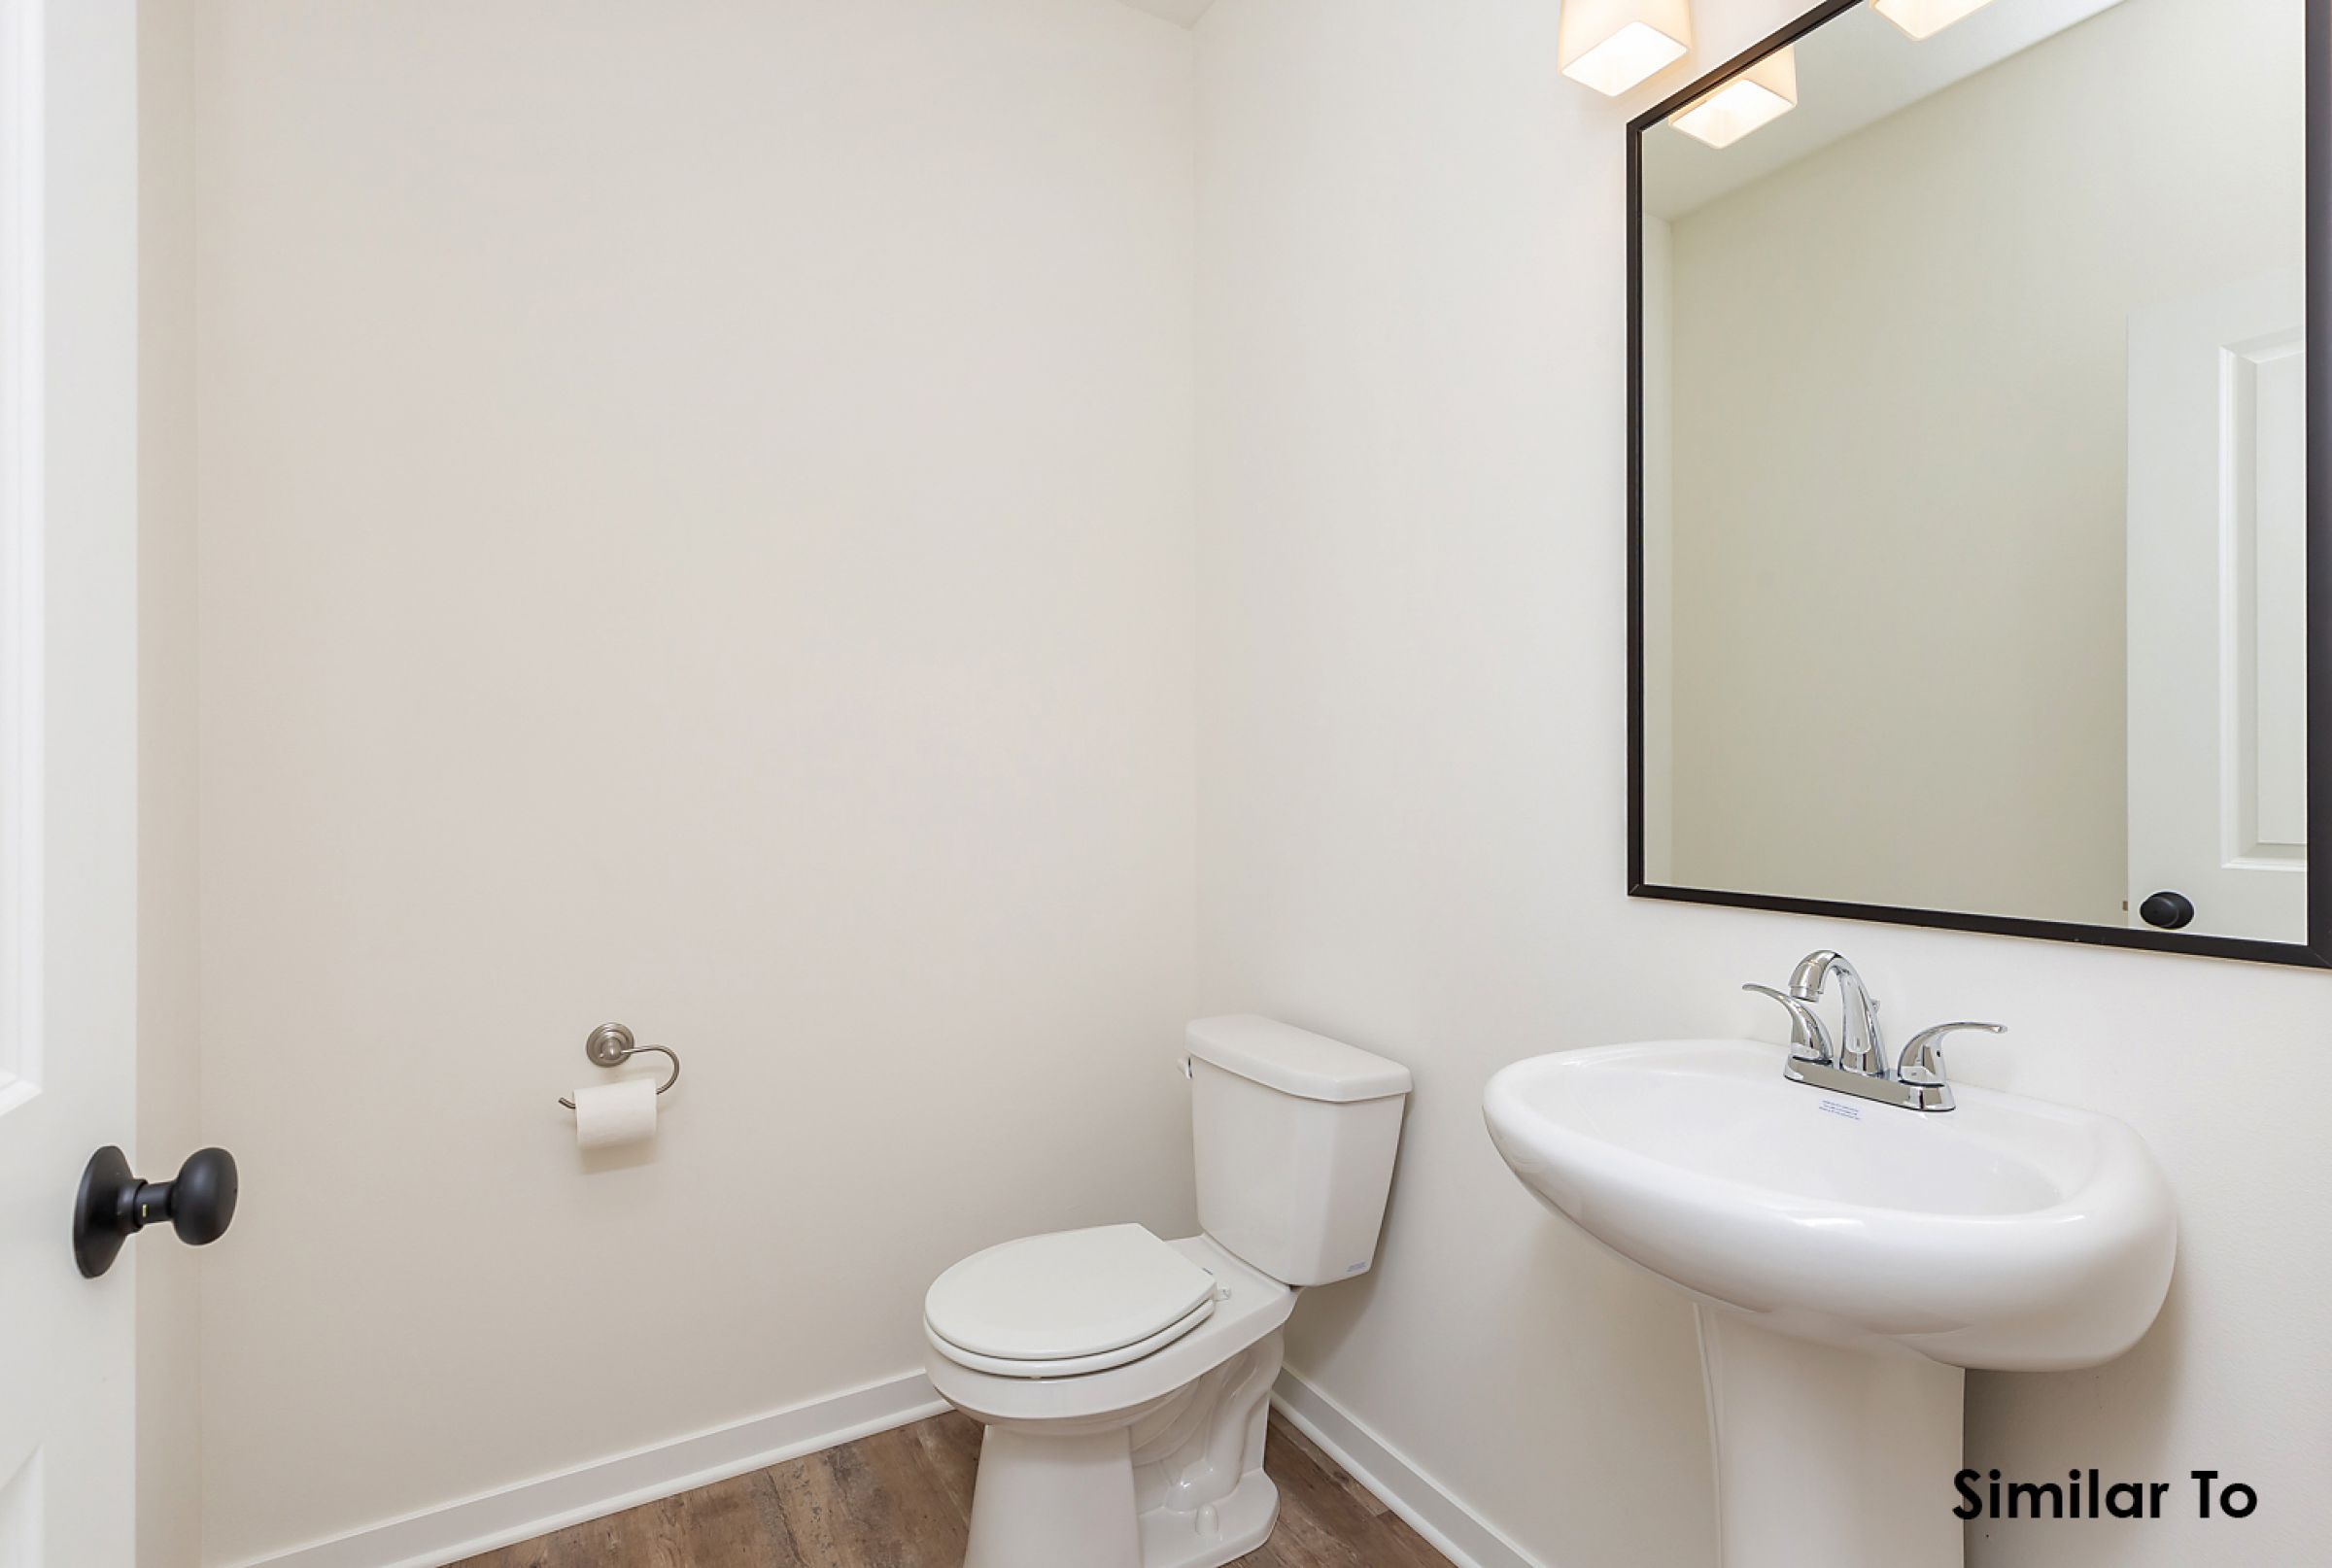 residential-warren-county-iowa-0-acres-listing-number-15134-1-2020-08-27-185015.jpg